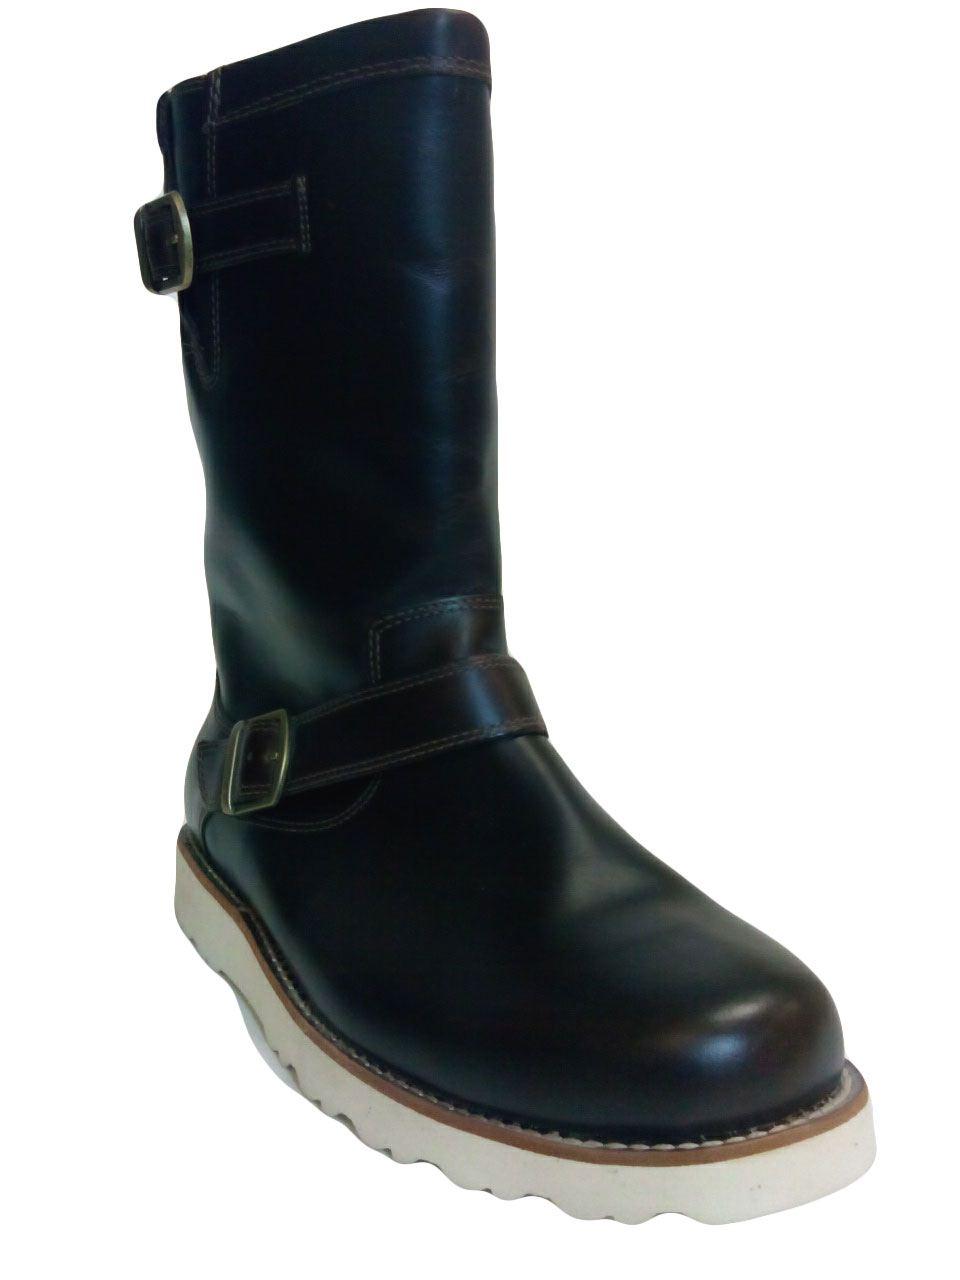 06c44728dc2 Kmart Fluffy Ugg Boots